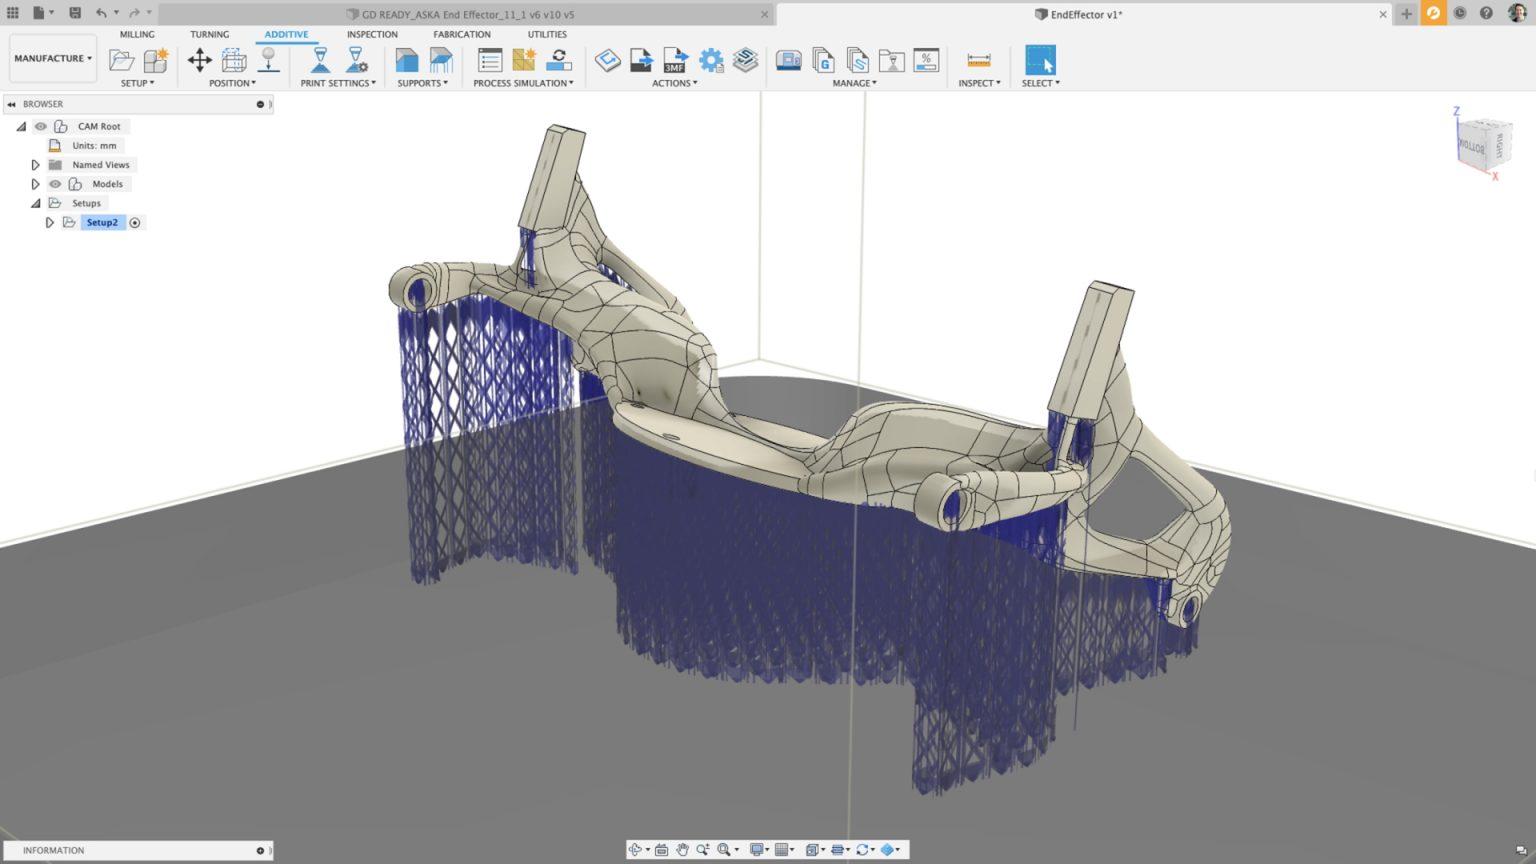 Autodesk Fusion 360 Additive Build Extension